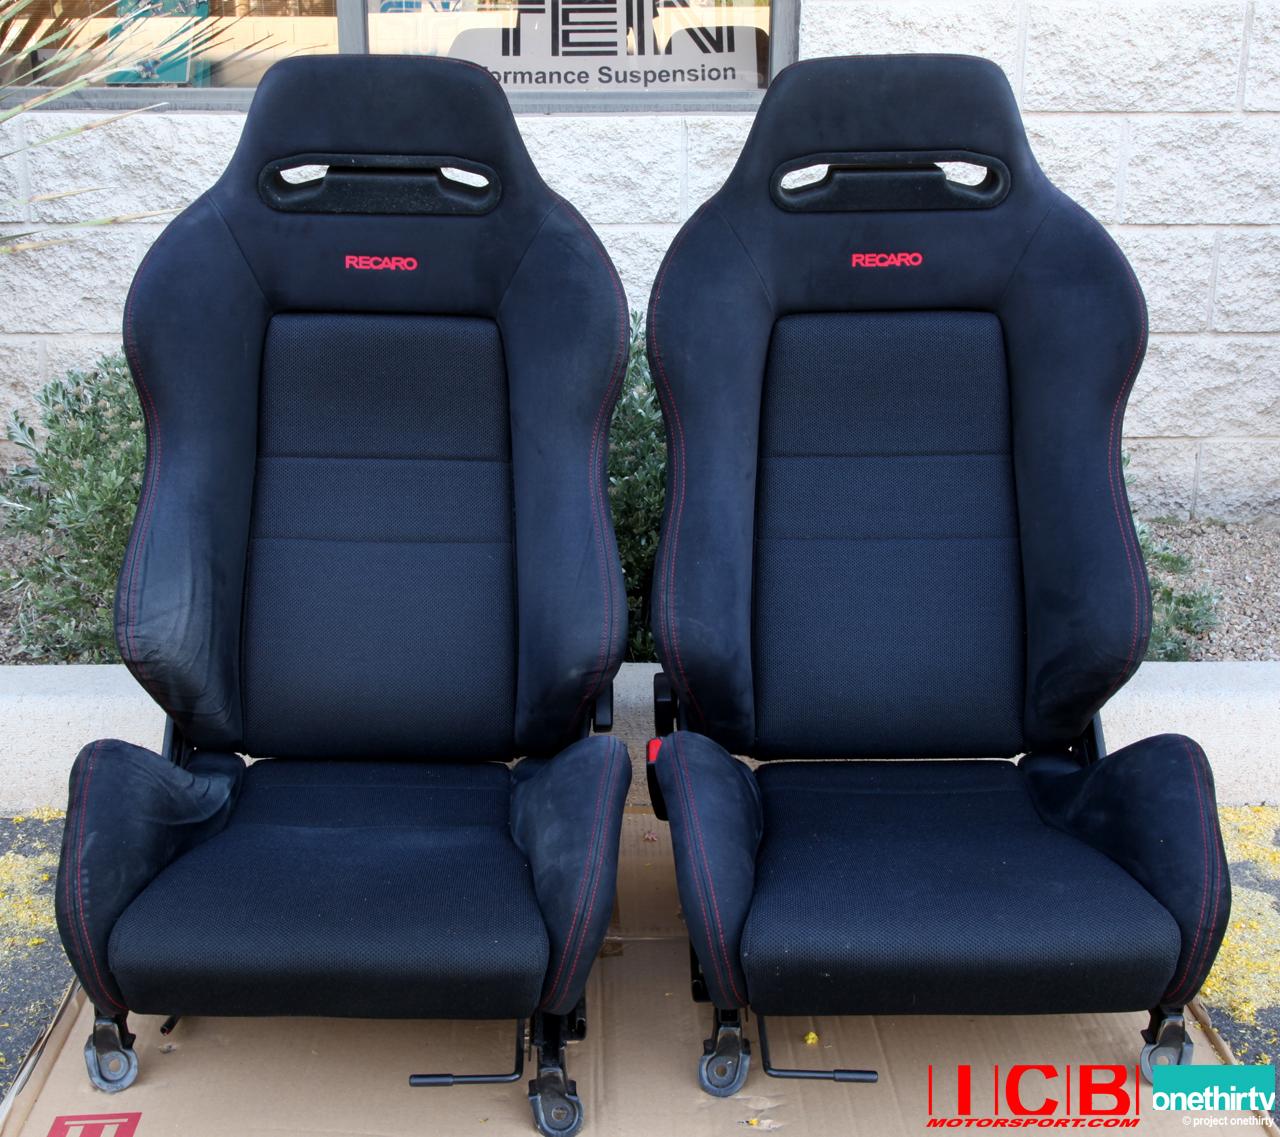 Used Honda DB8 Integra Type R Black Recaro Seats